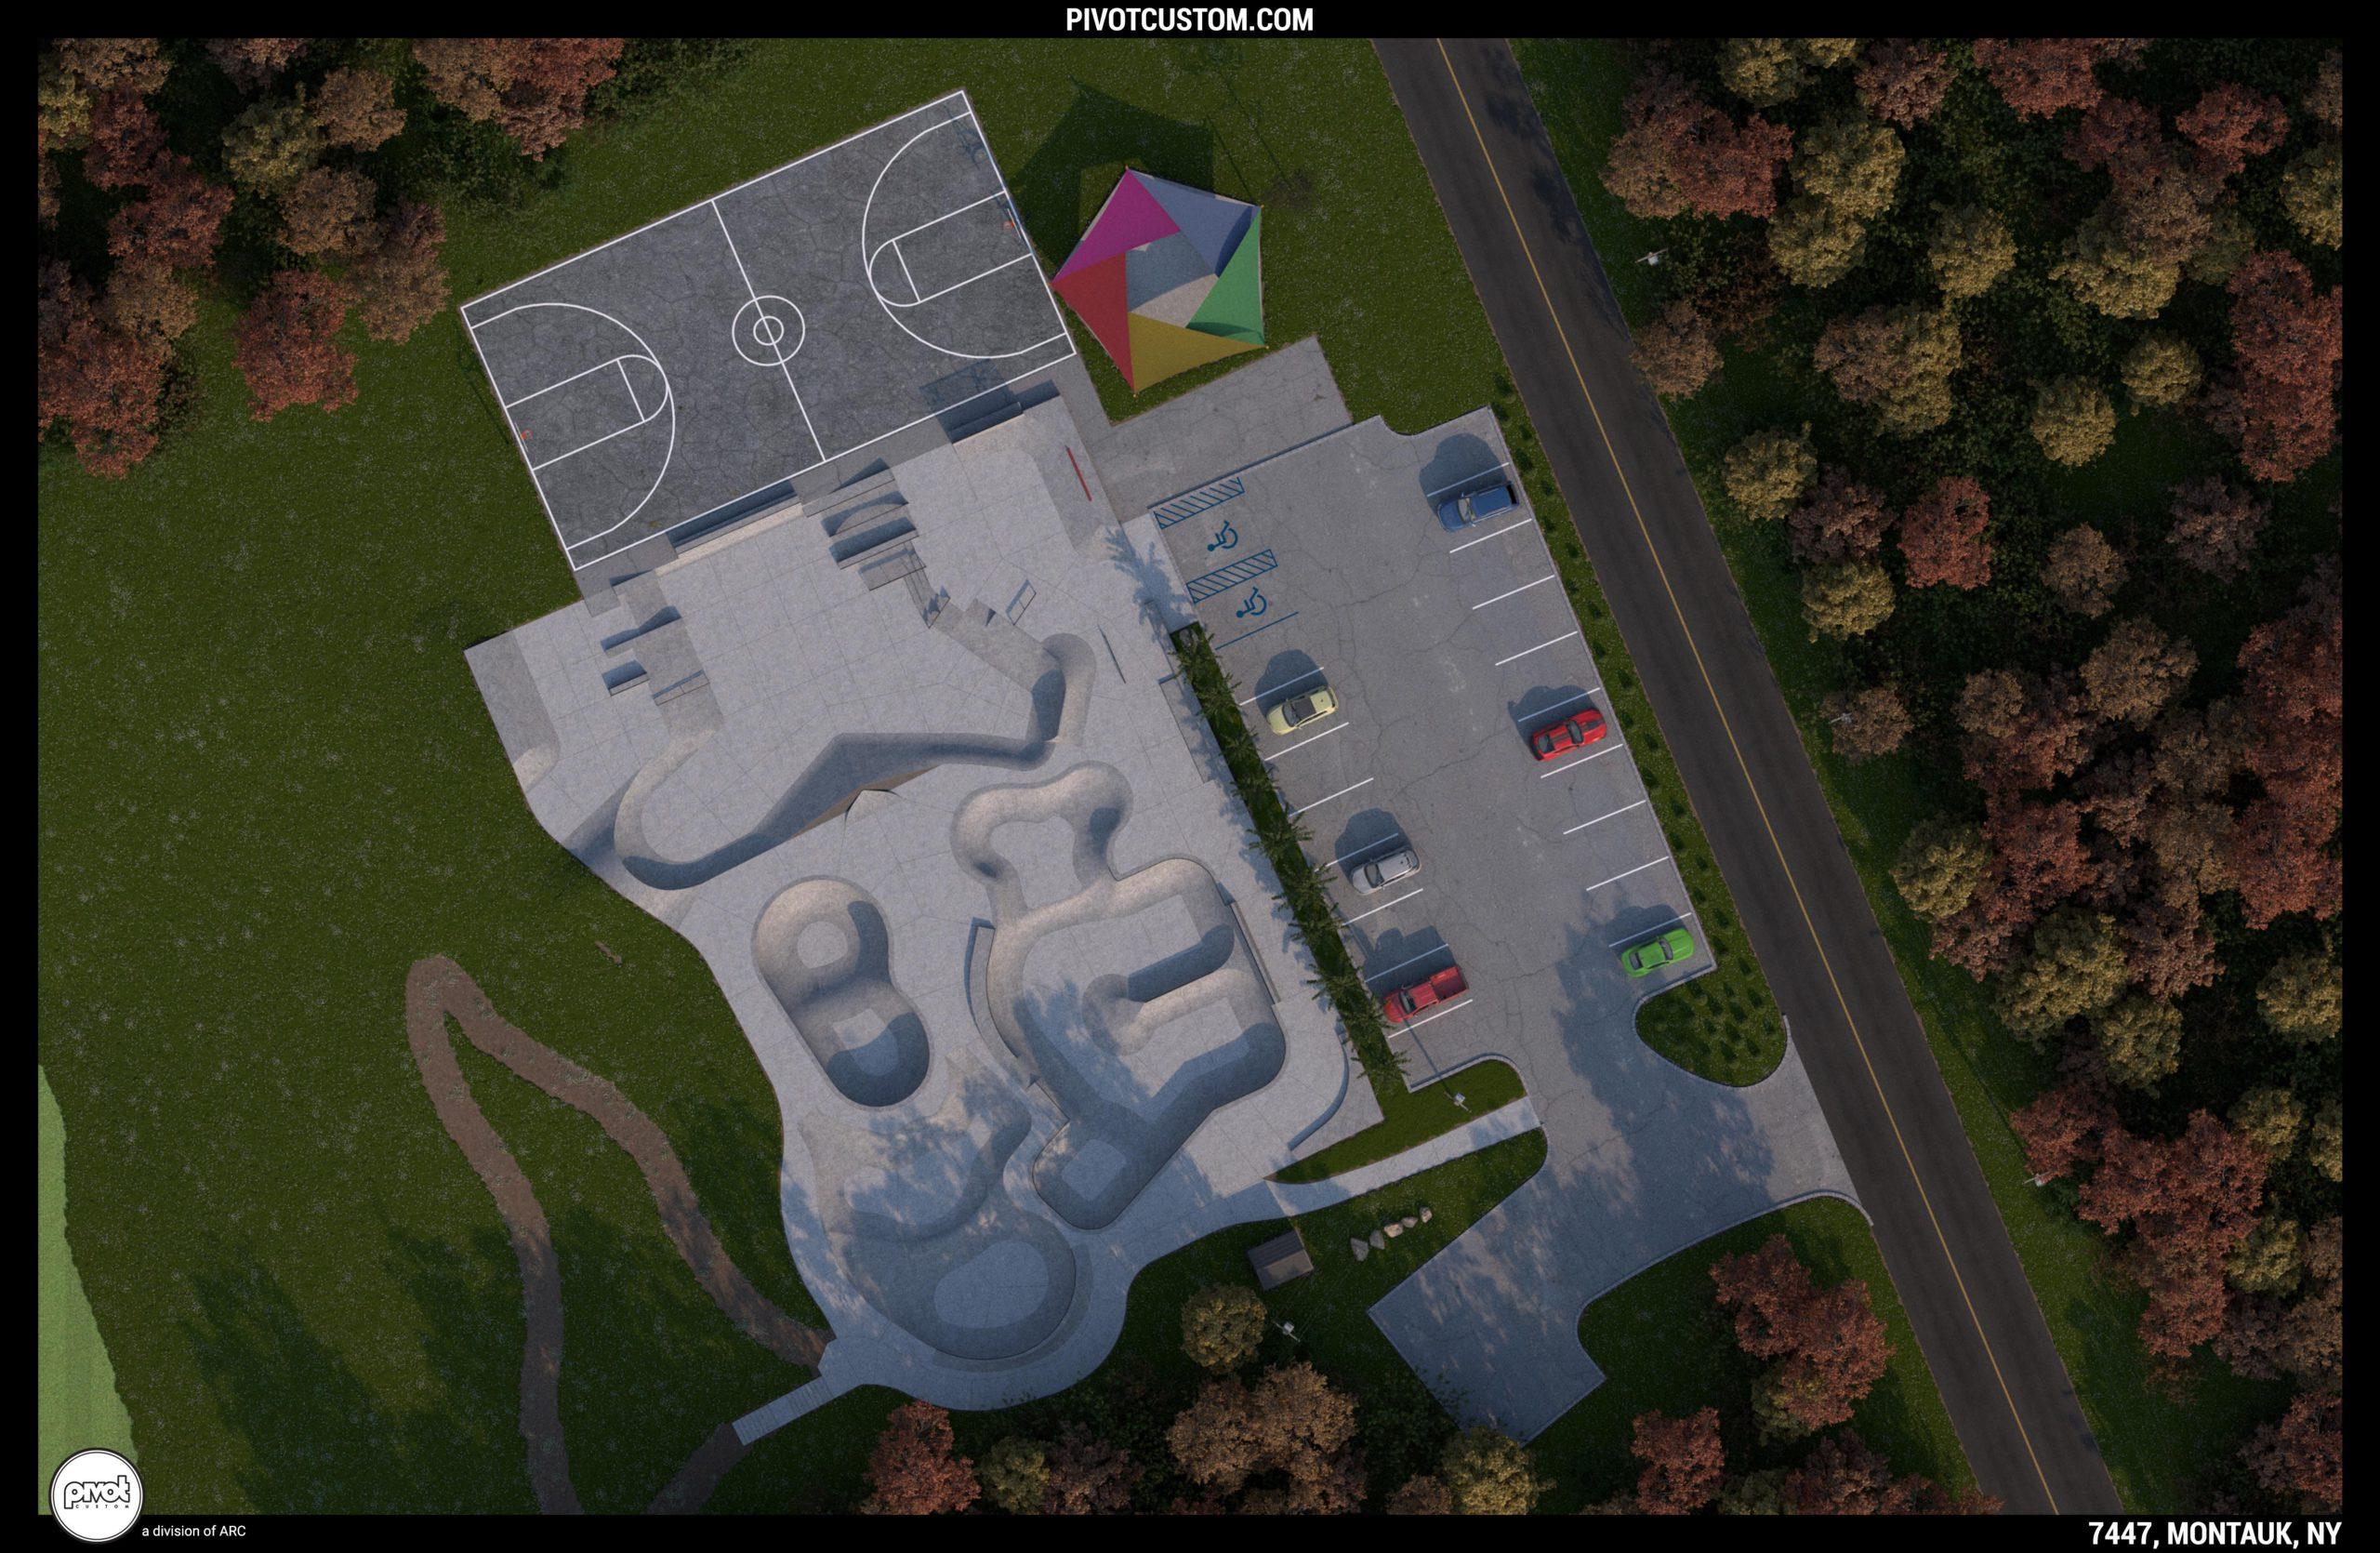 2021 Montauk Skatepark Renovation